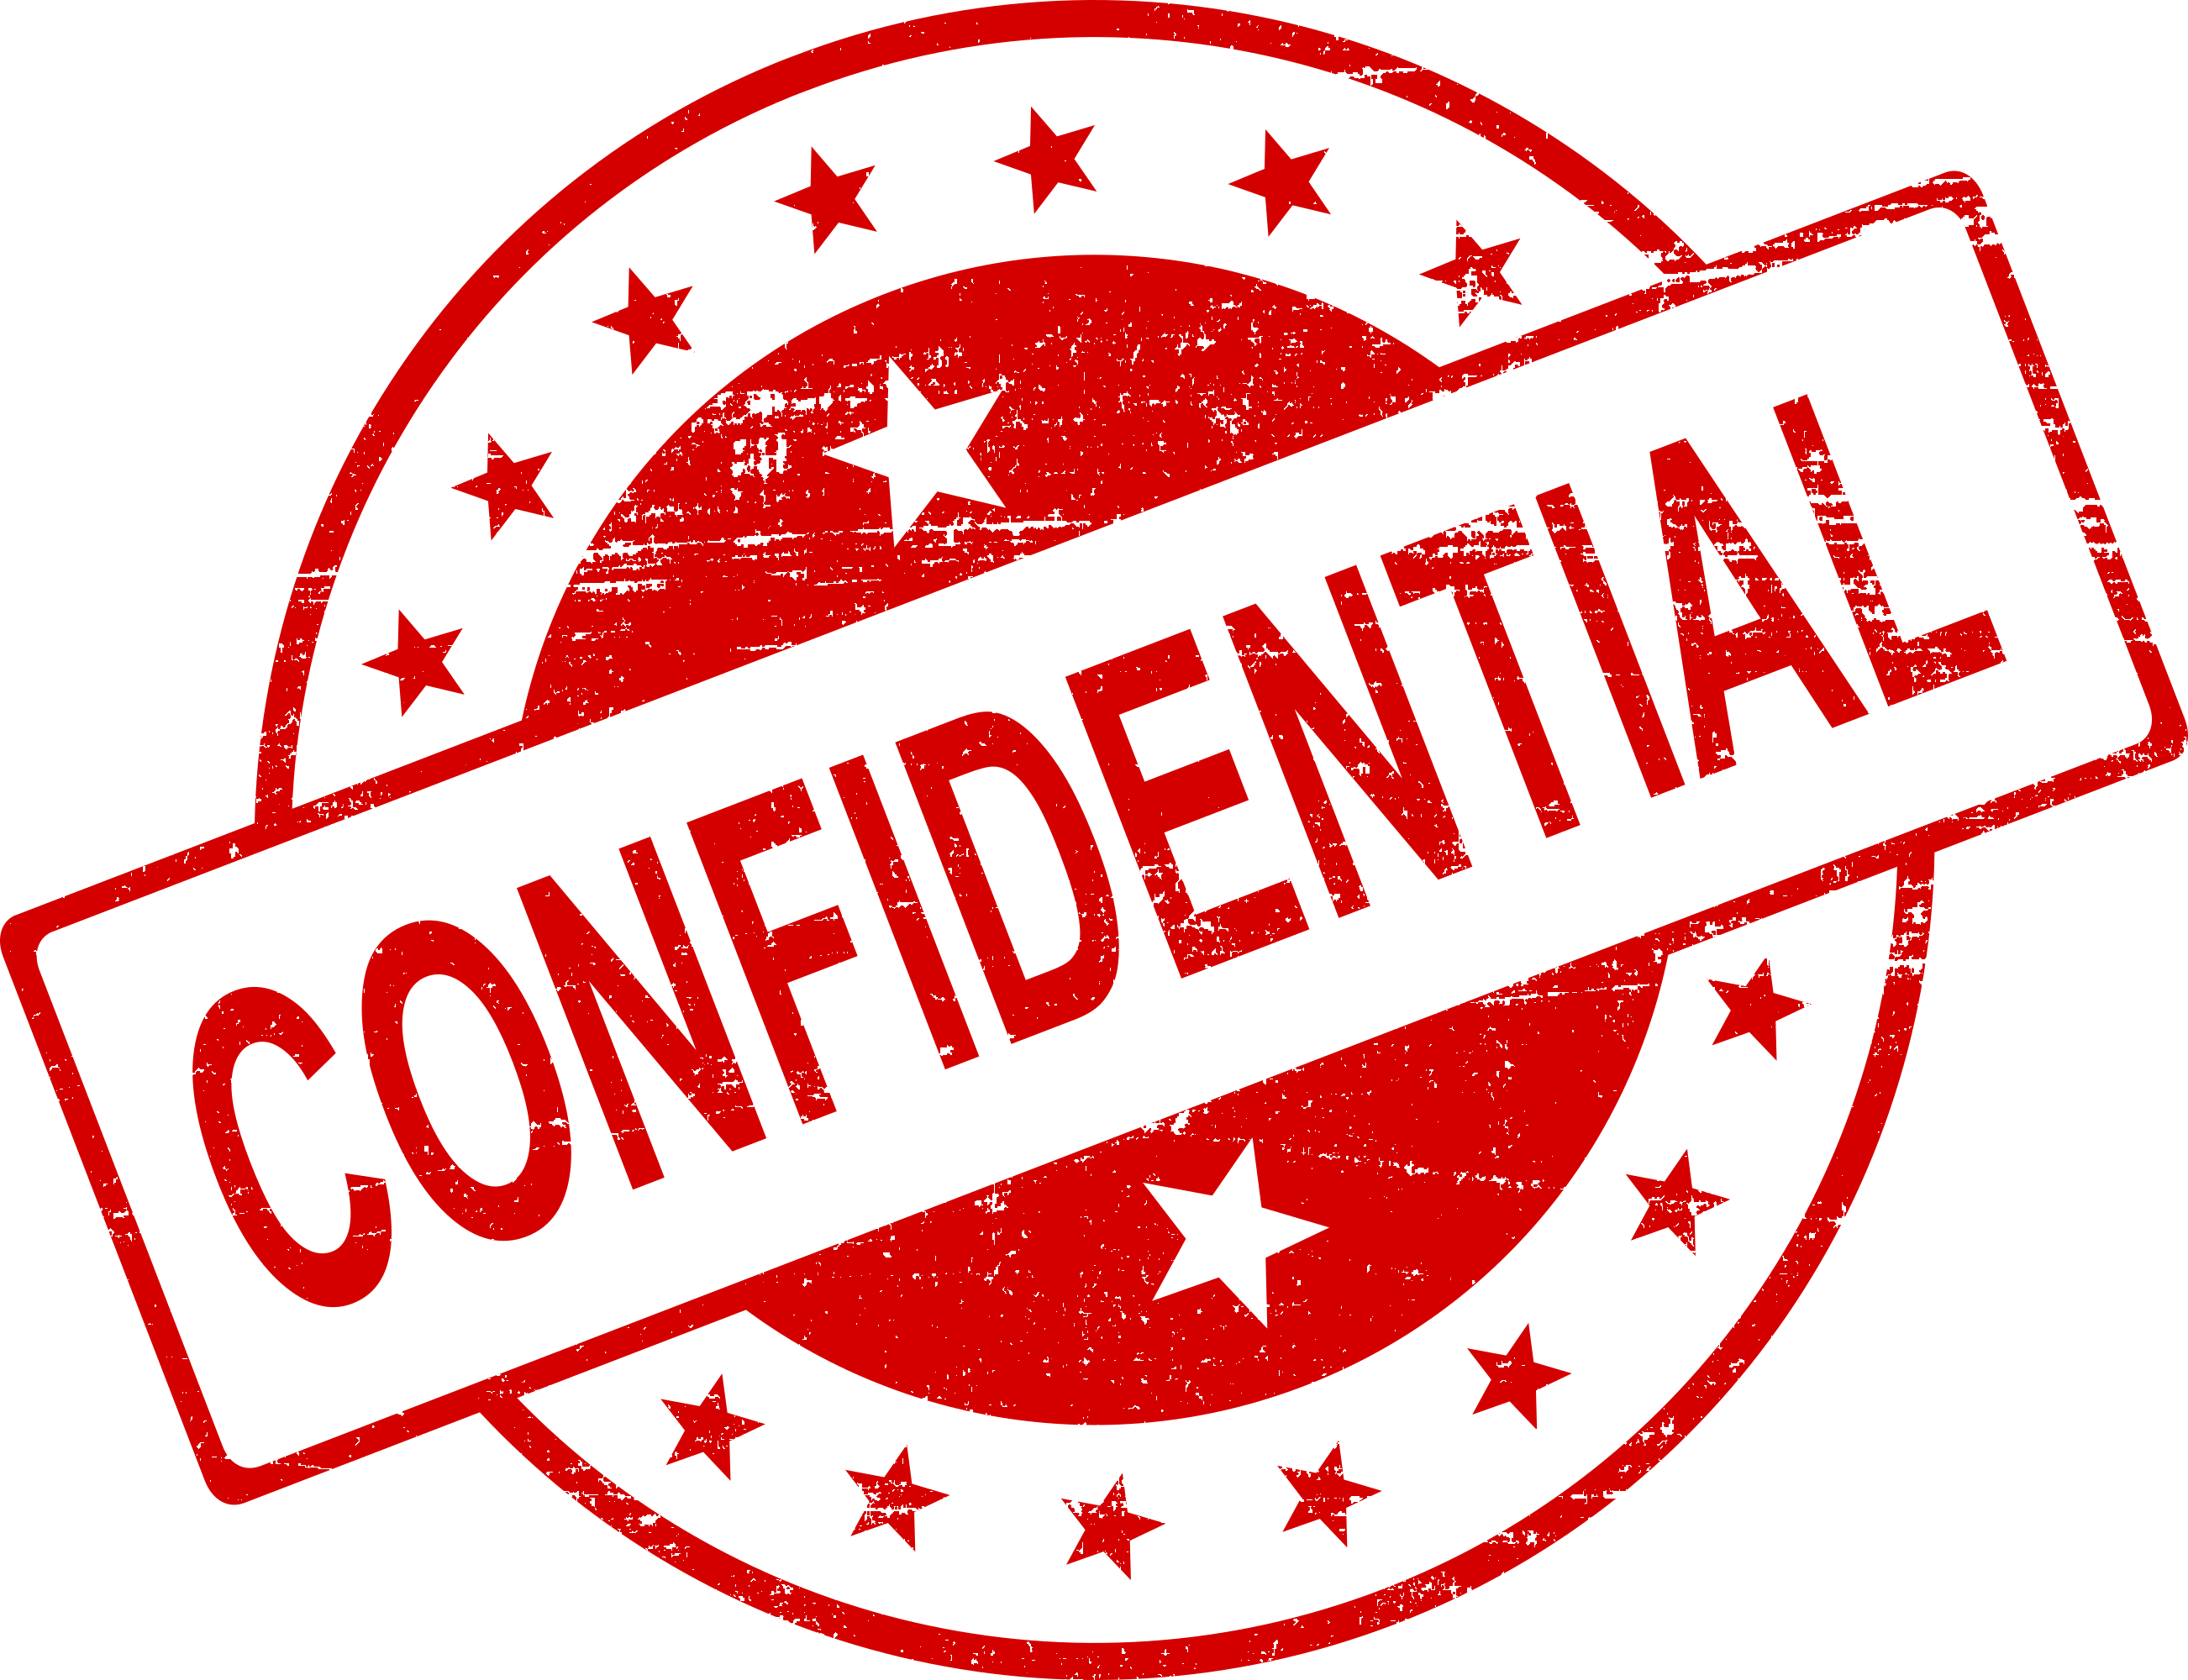 4 Confidential Stamp Png Transparent Onlygfx Com